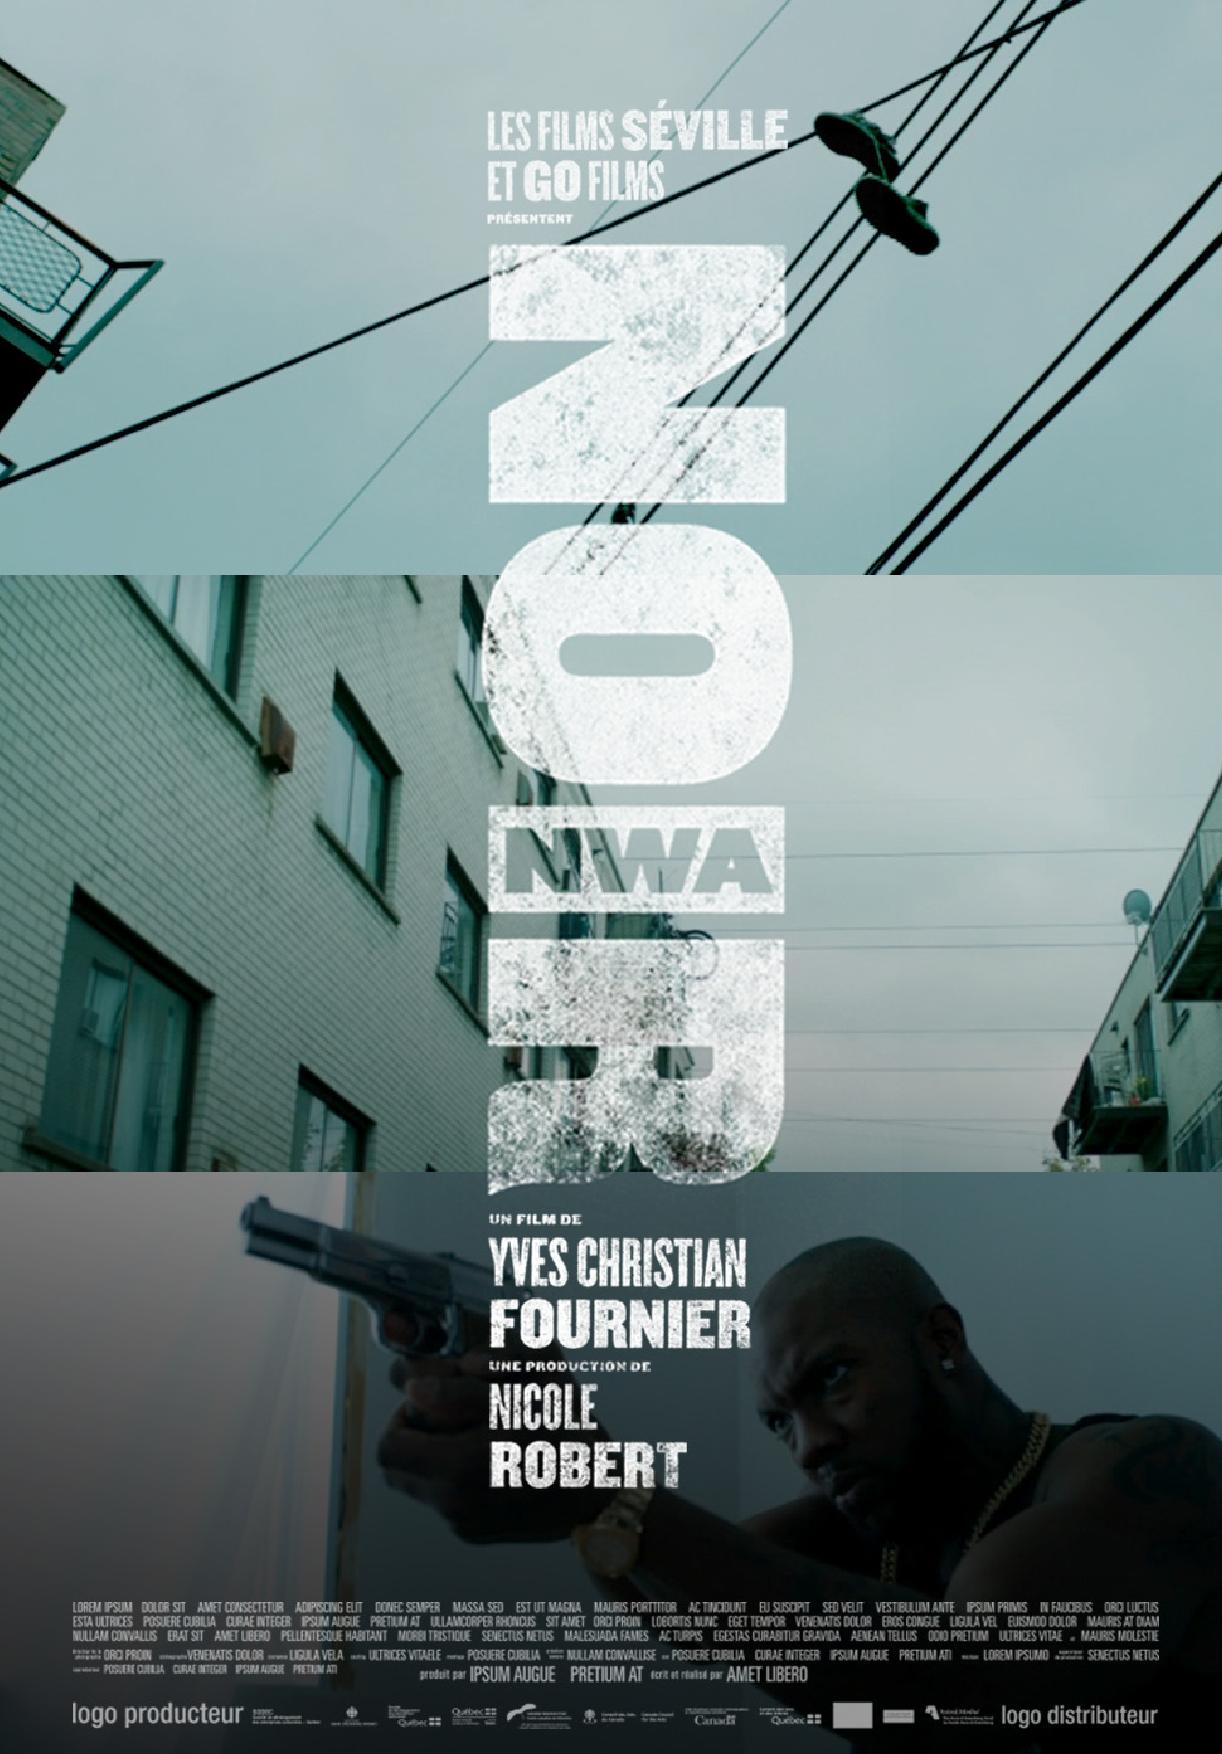 NOIR-Poster-RENZO-13oct-1_00003.jpg